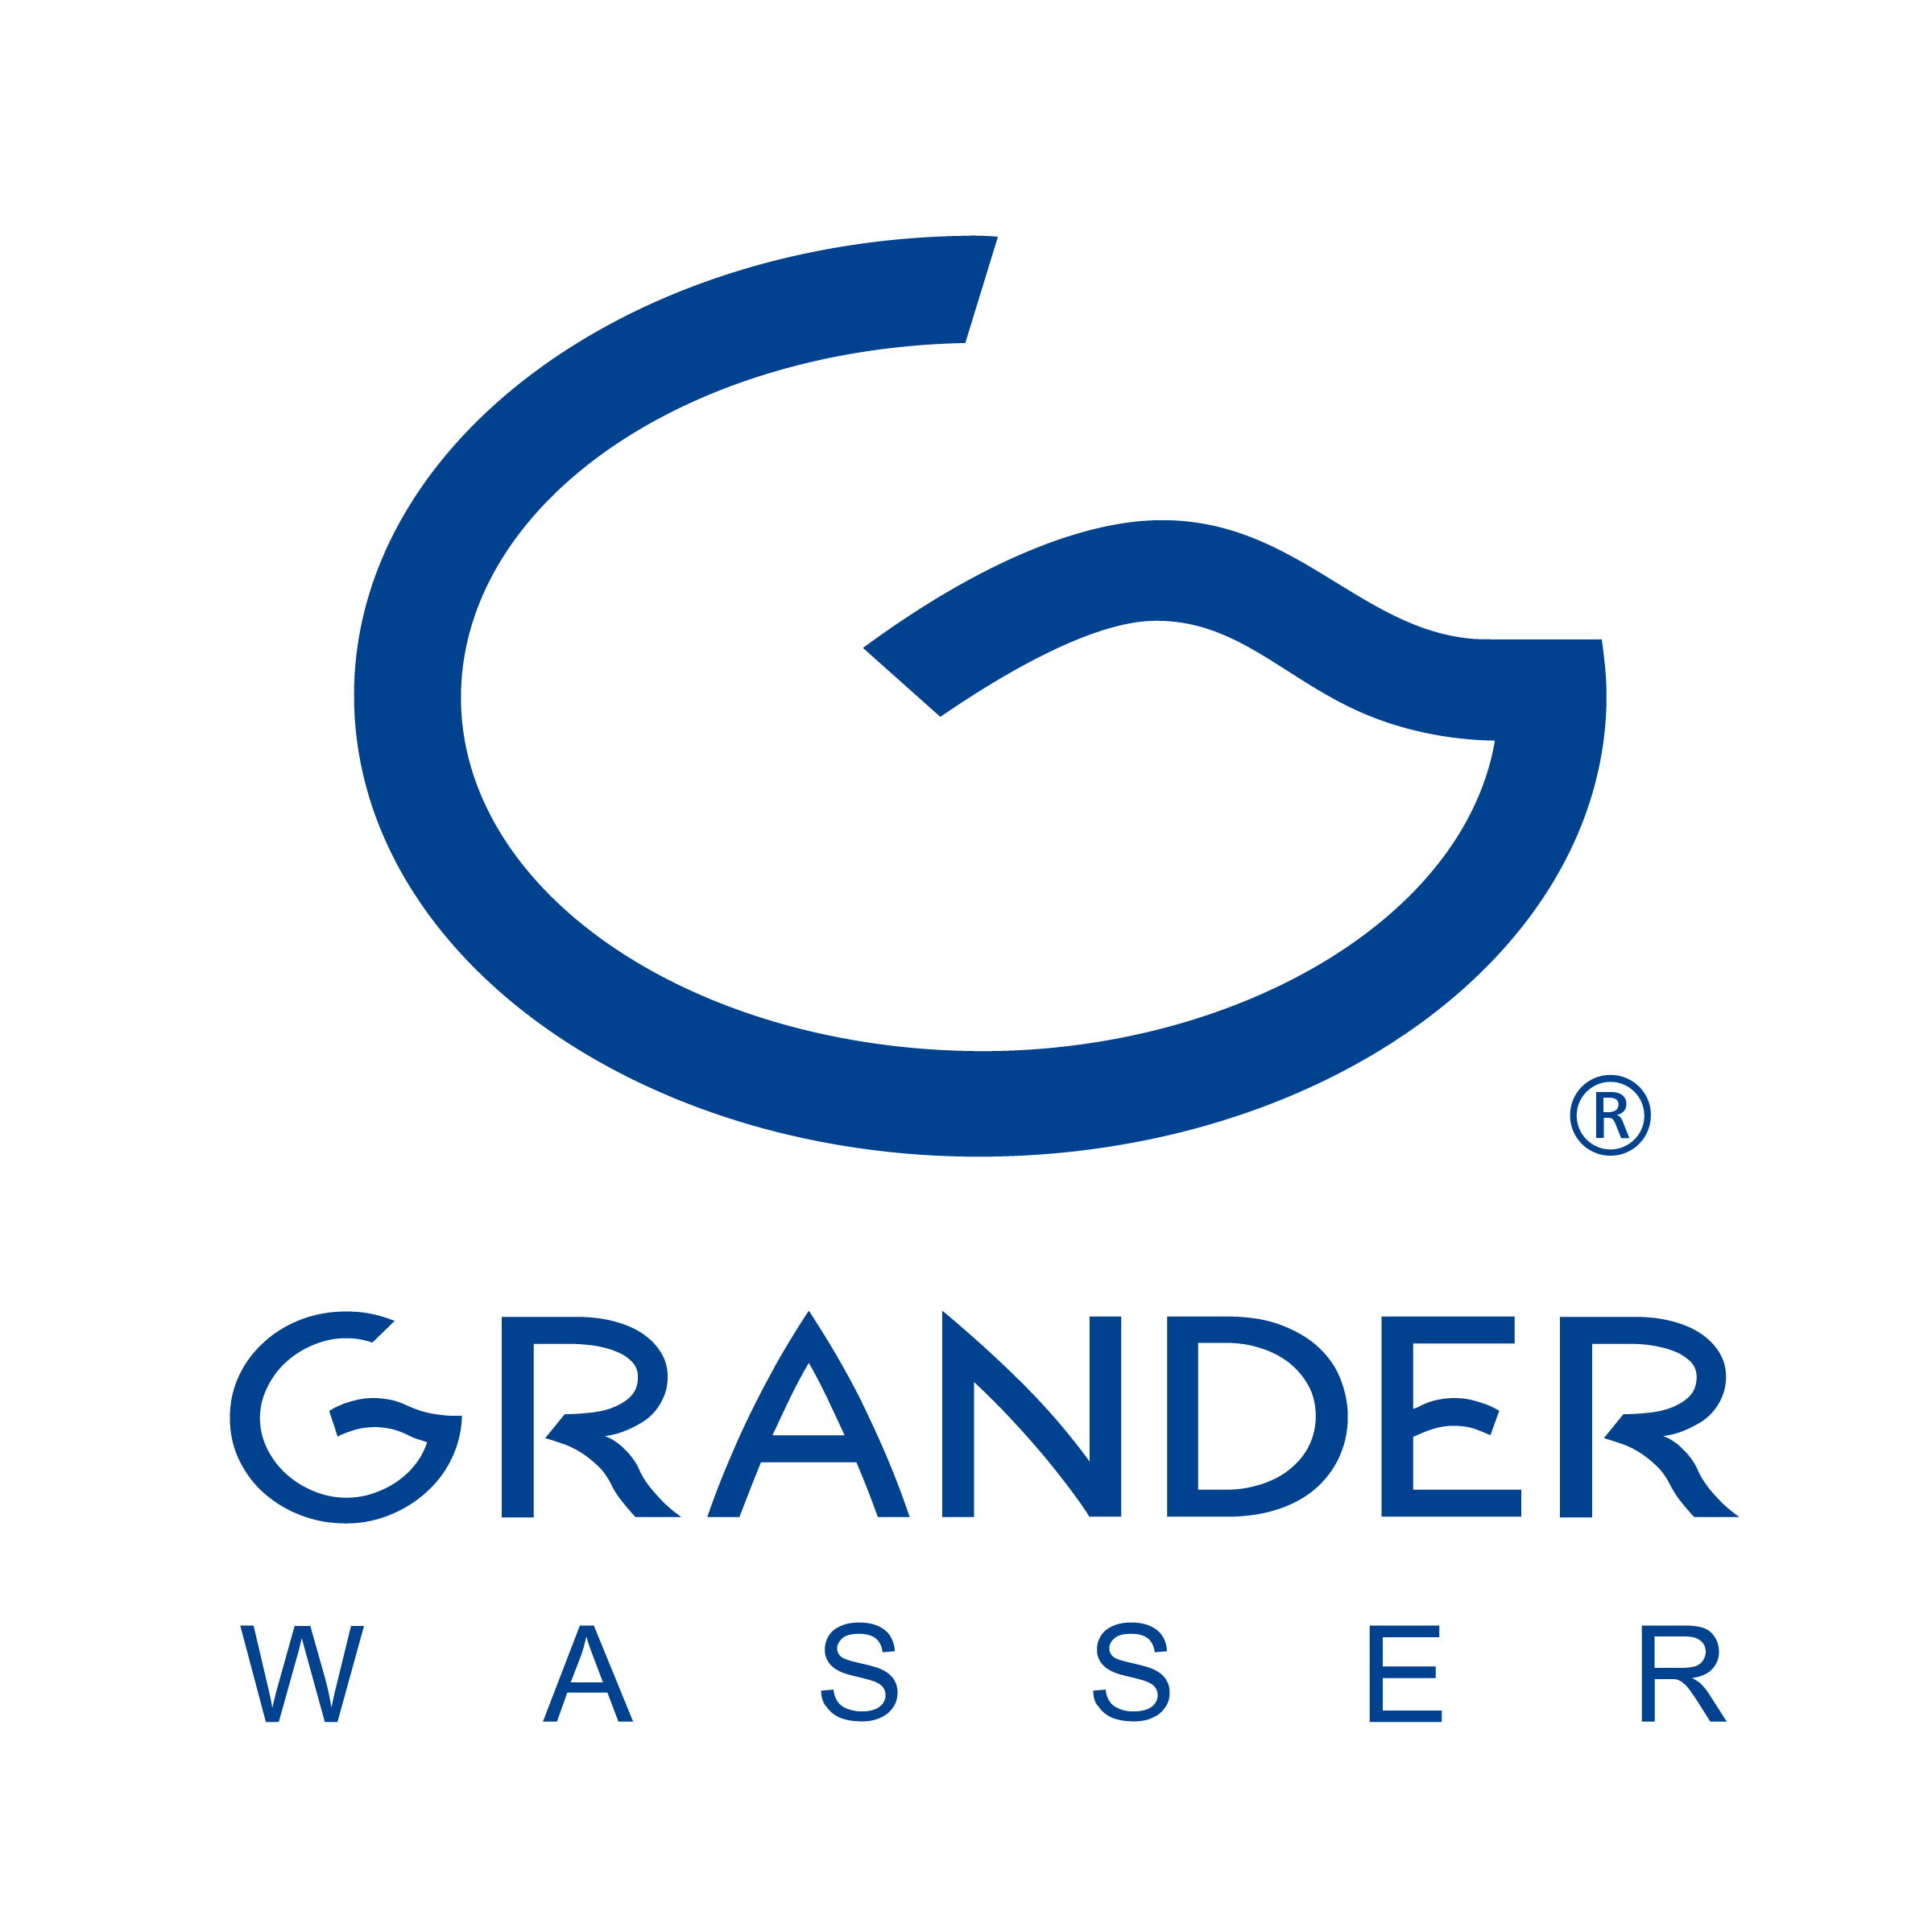 grander wasser logo